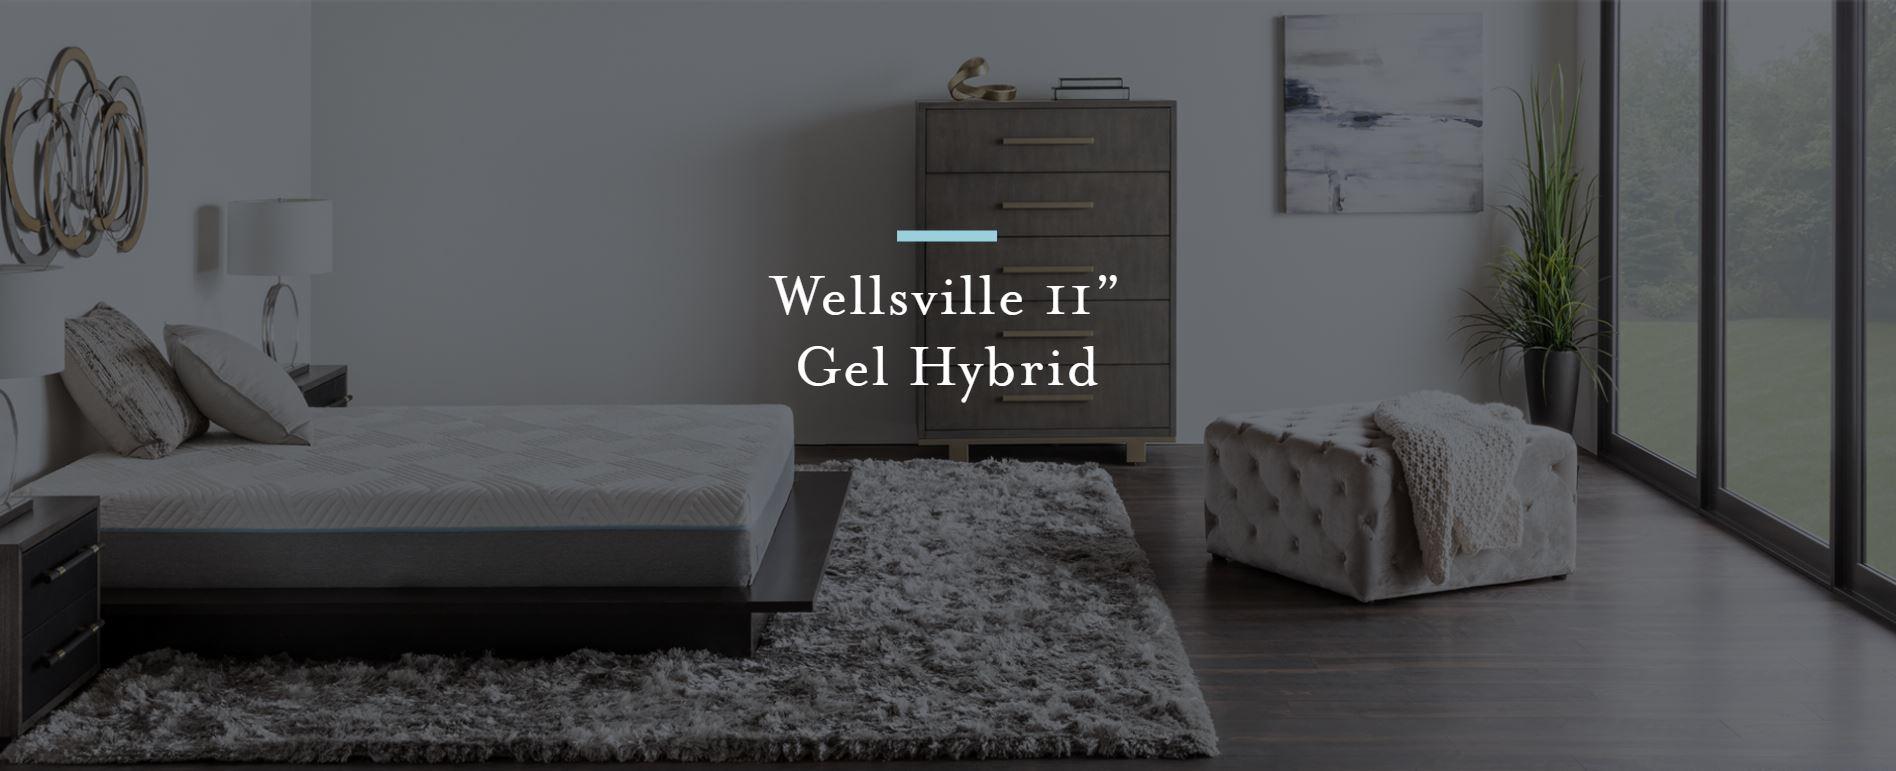 Wellsville Welcome Banner